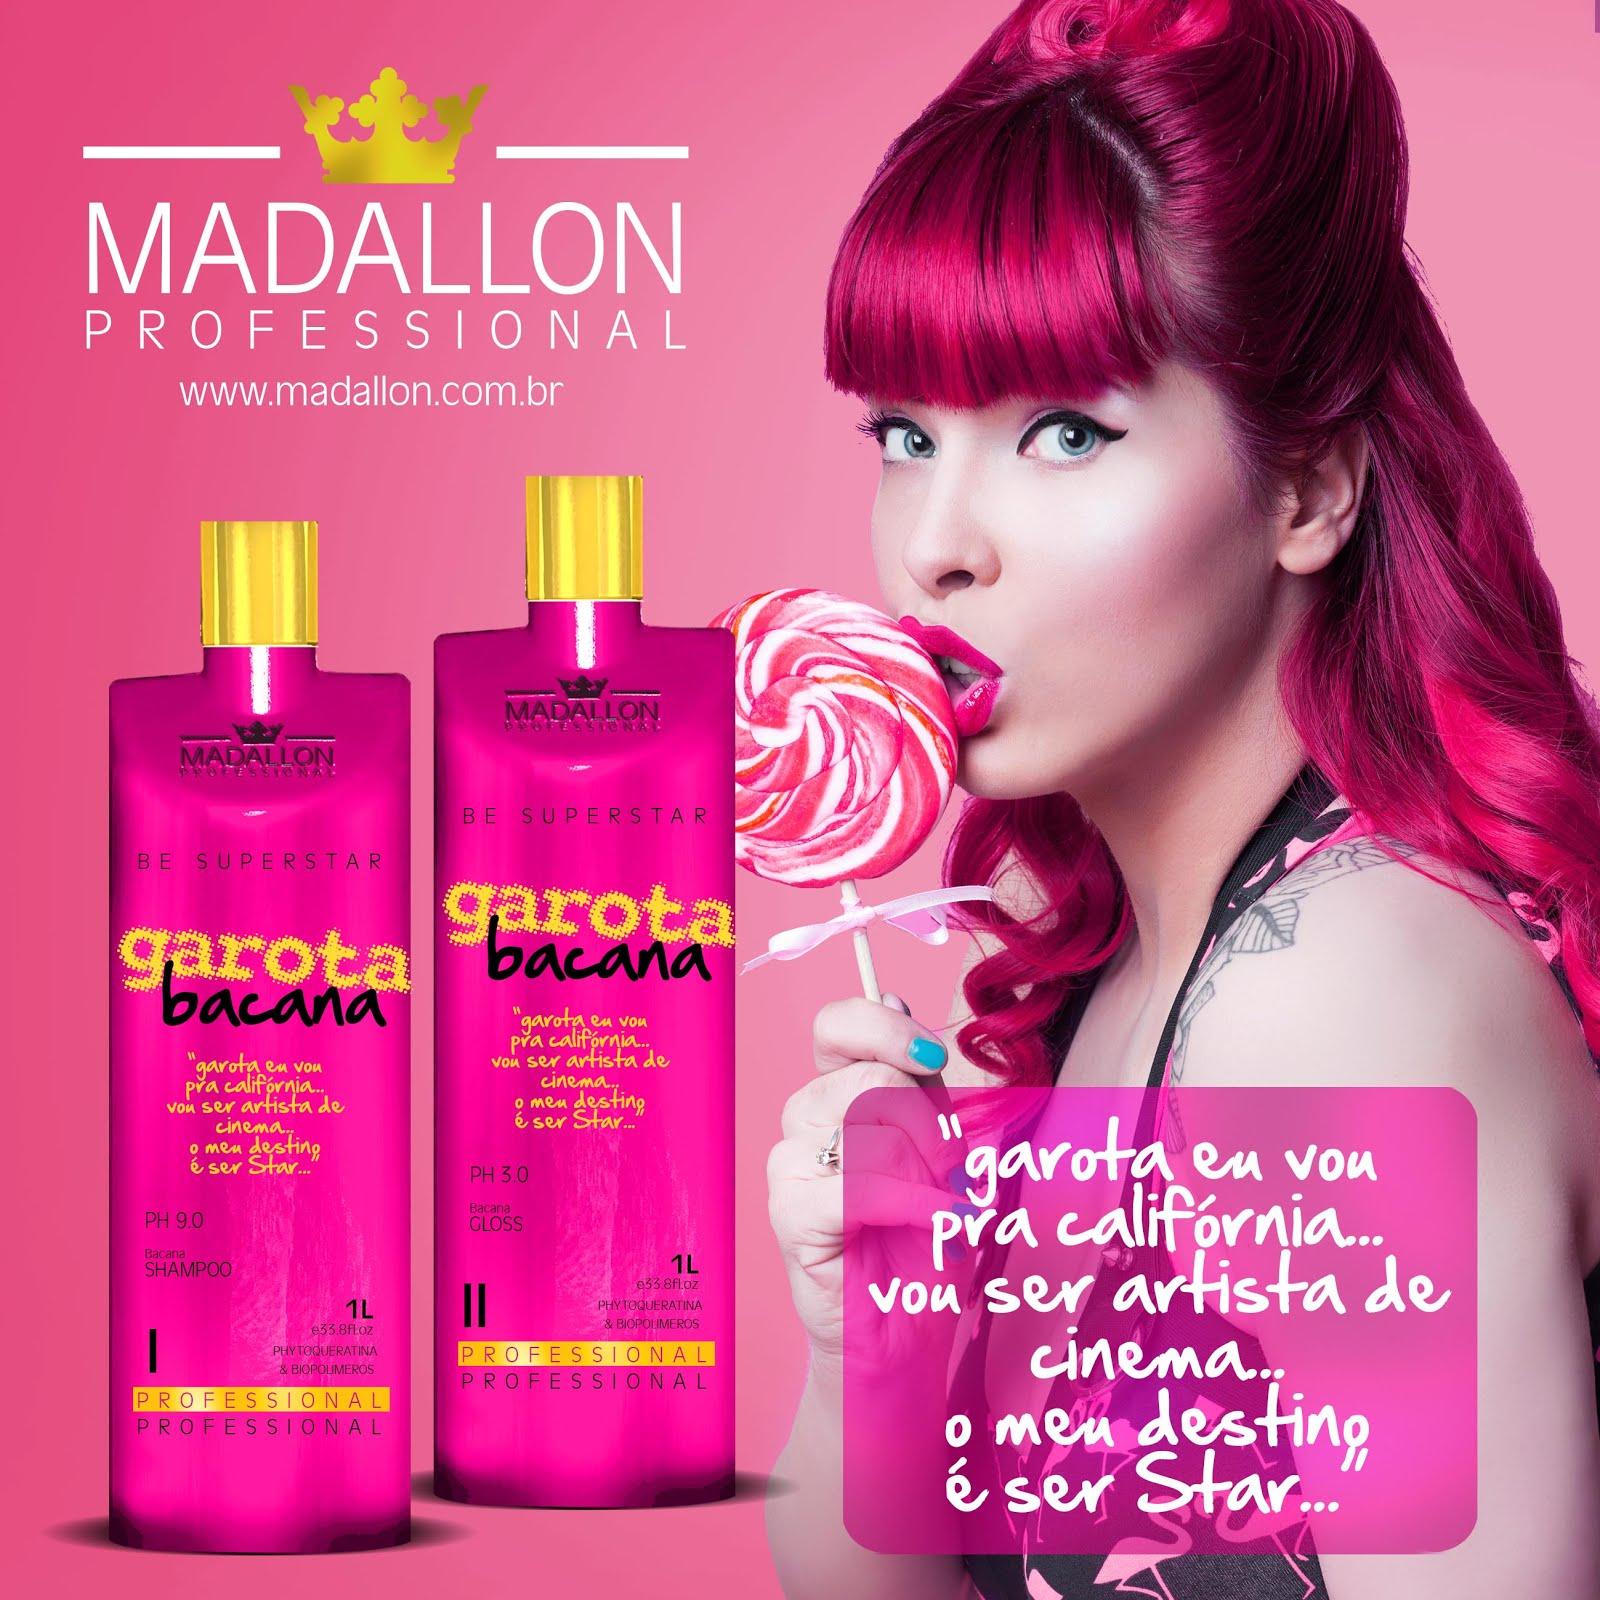 Madallon